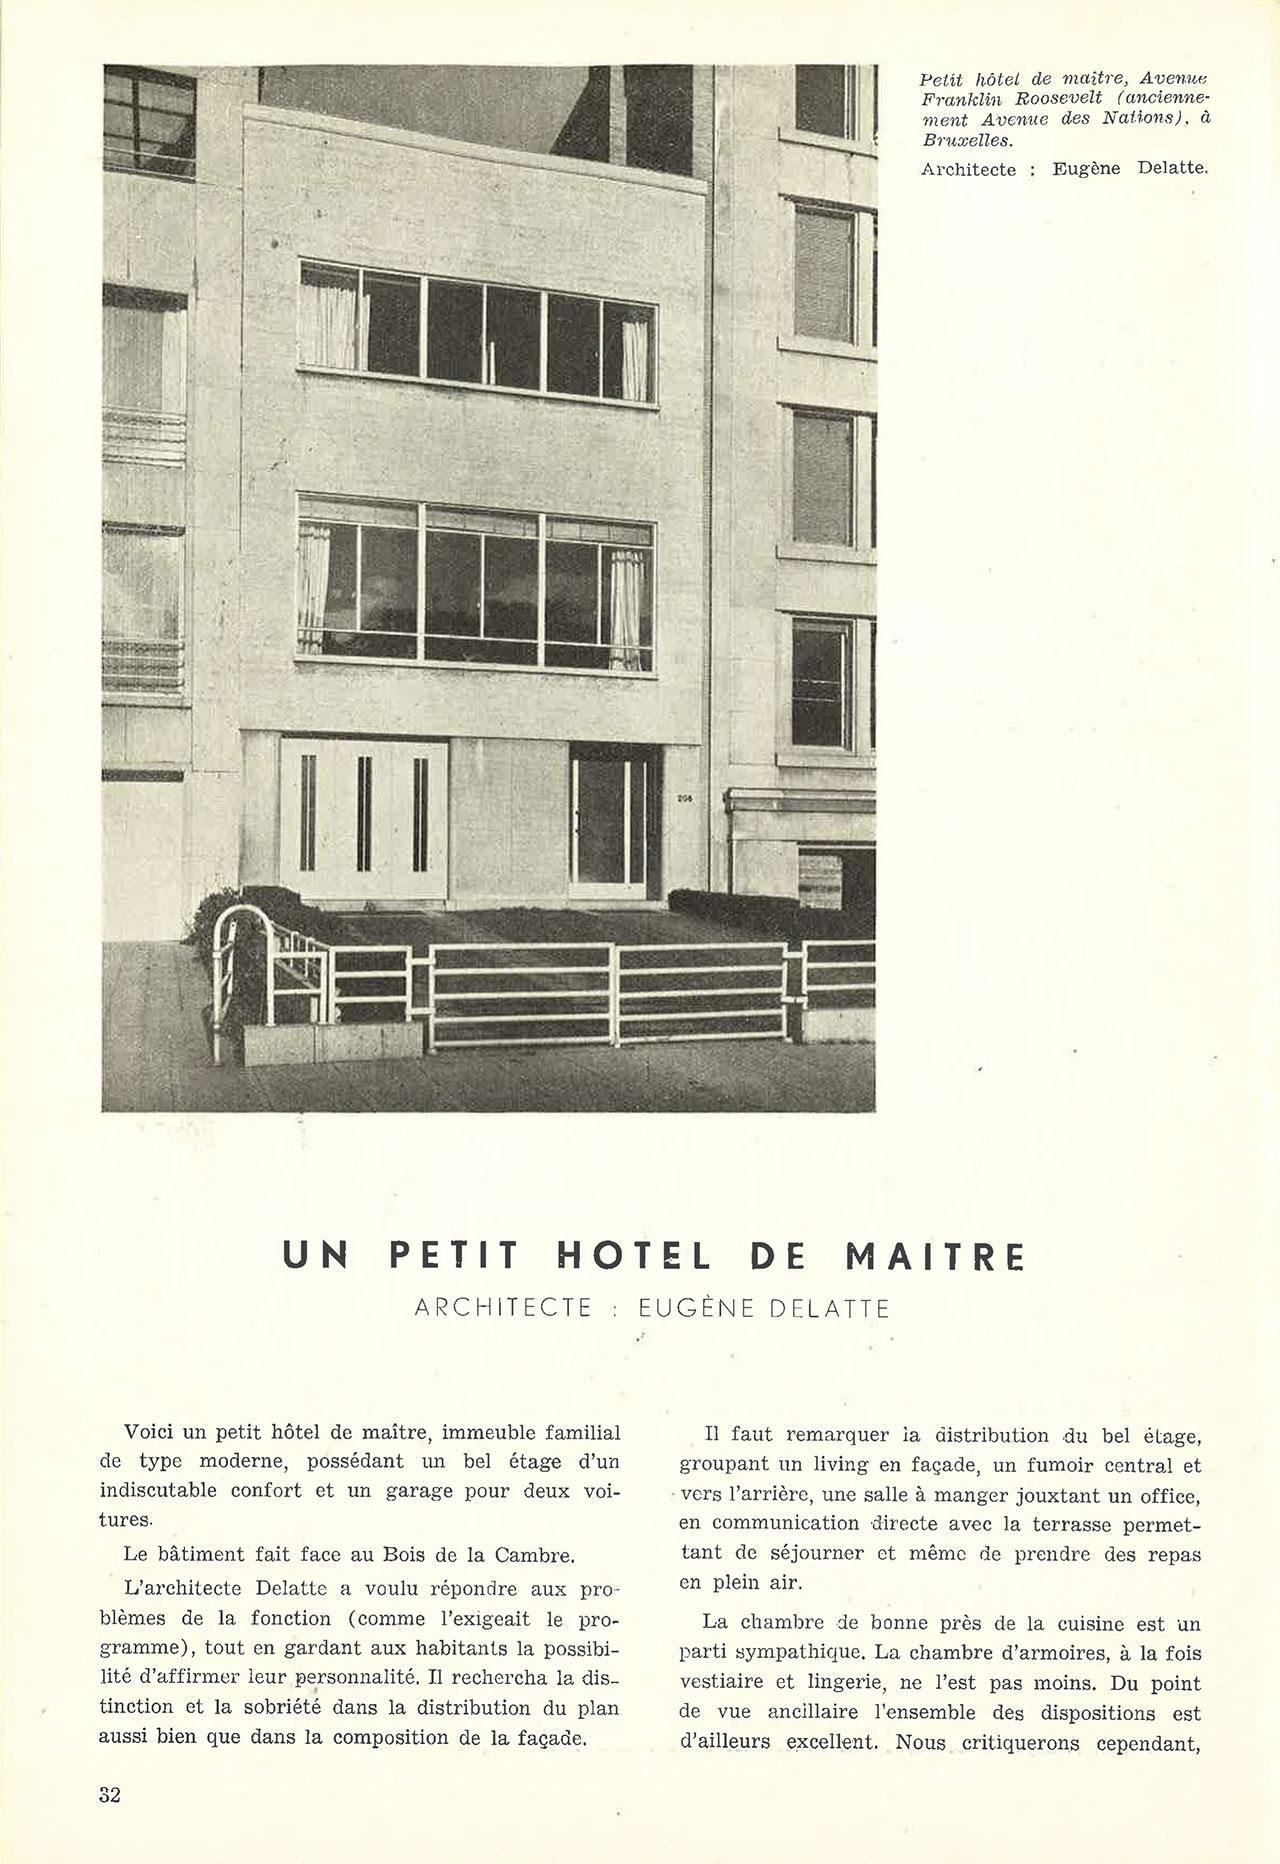 Un petit hôtel de maître